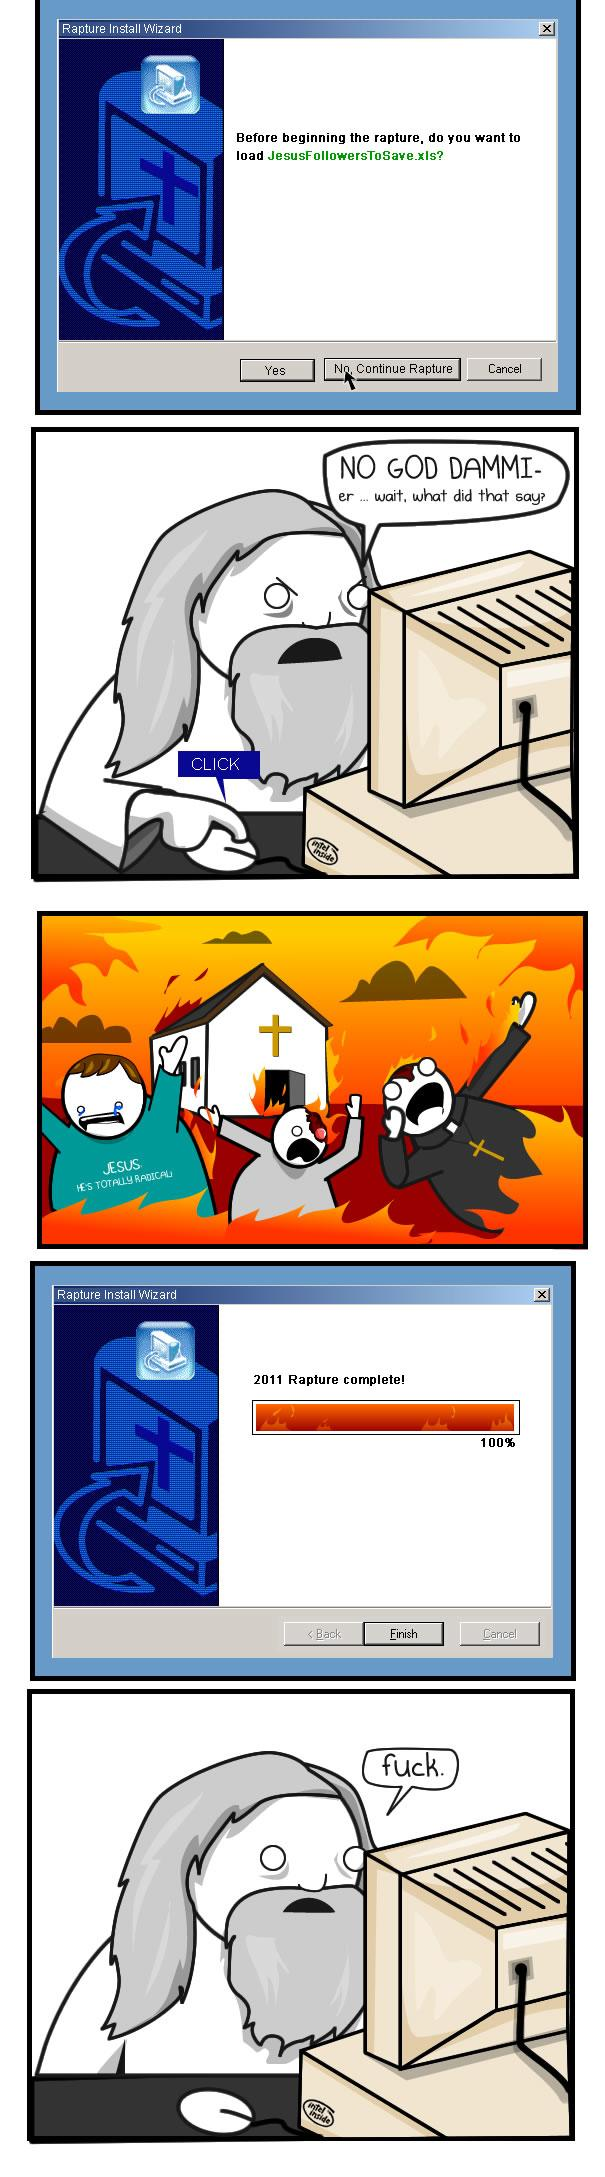 Autors: Mikosh Windows > Jesus!